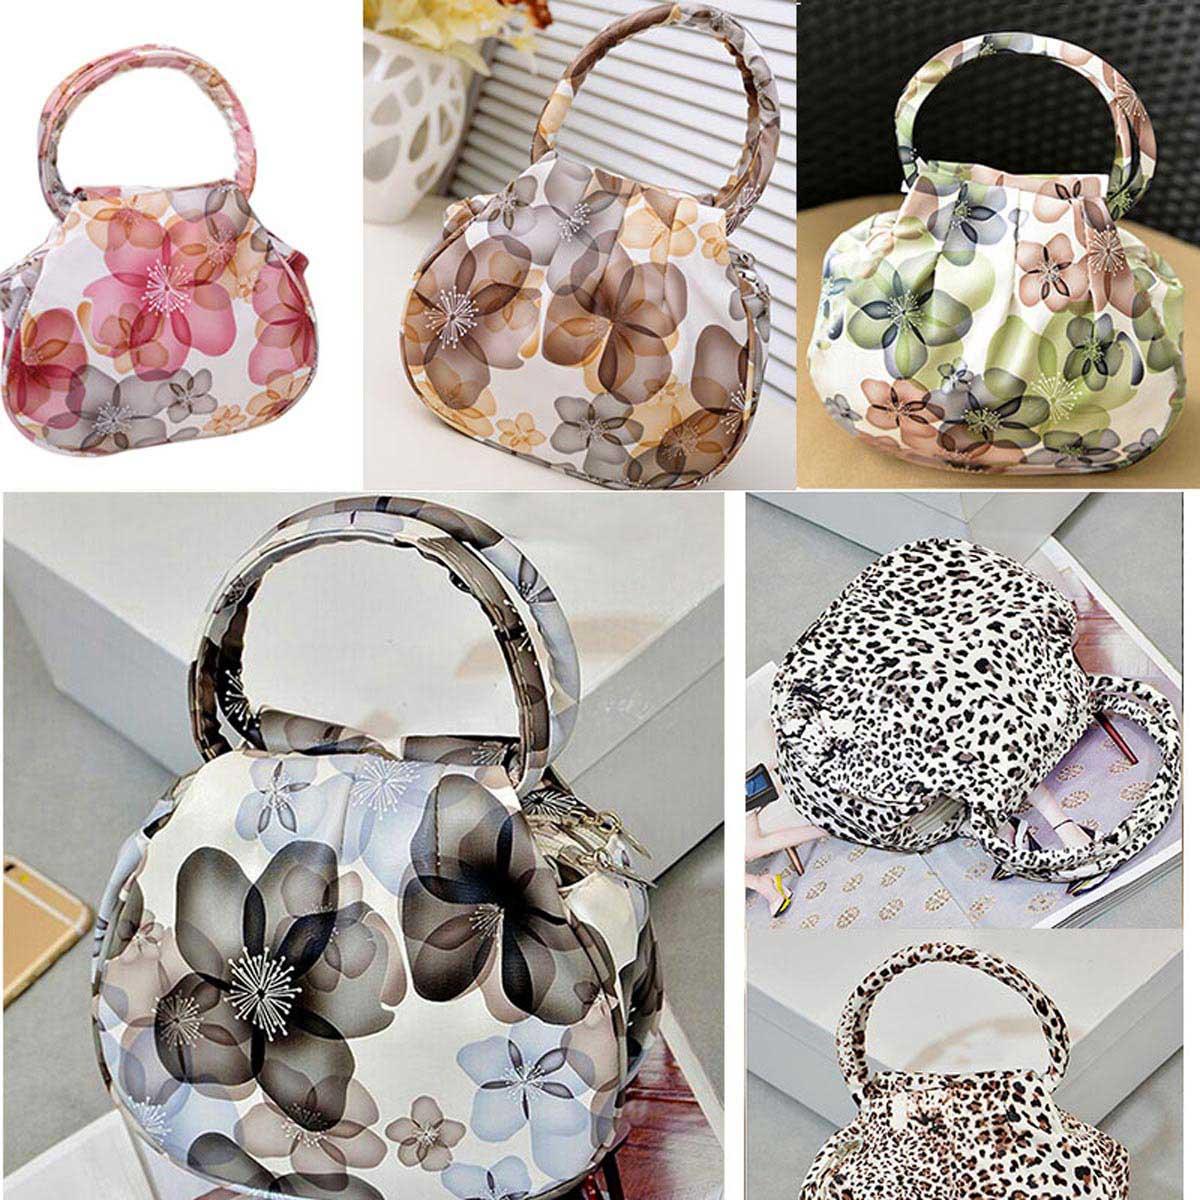 New Fashion Vintage Women Coin Purse Clutch Wristlet Wallet PU Bag Phone Keys Makeup Cards Holder Tote Best Sale-WT